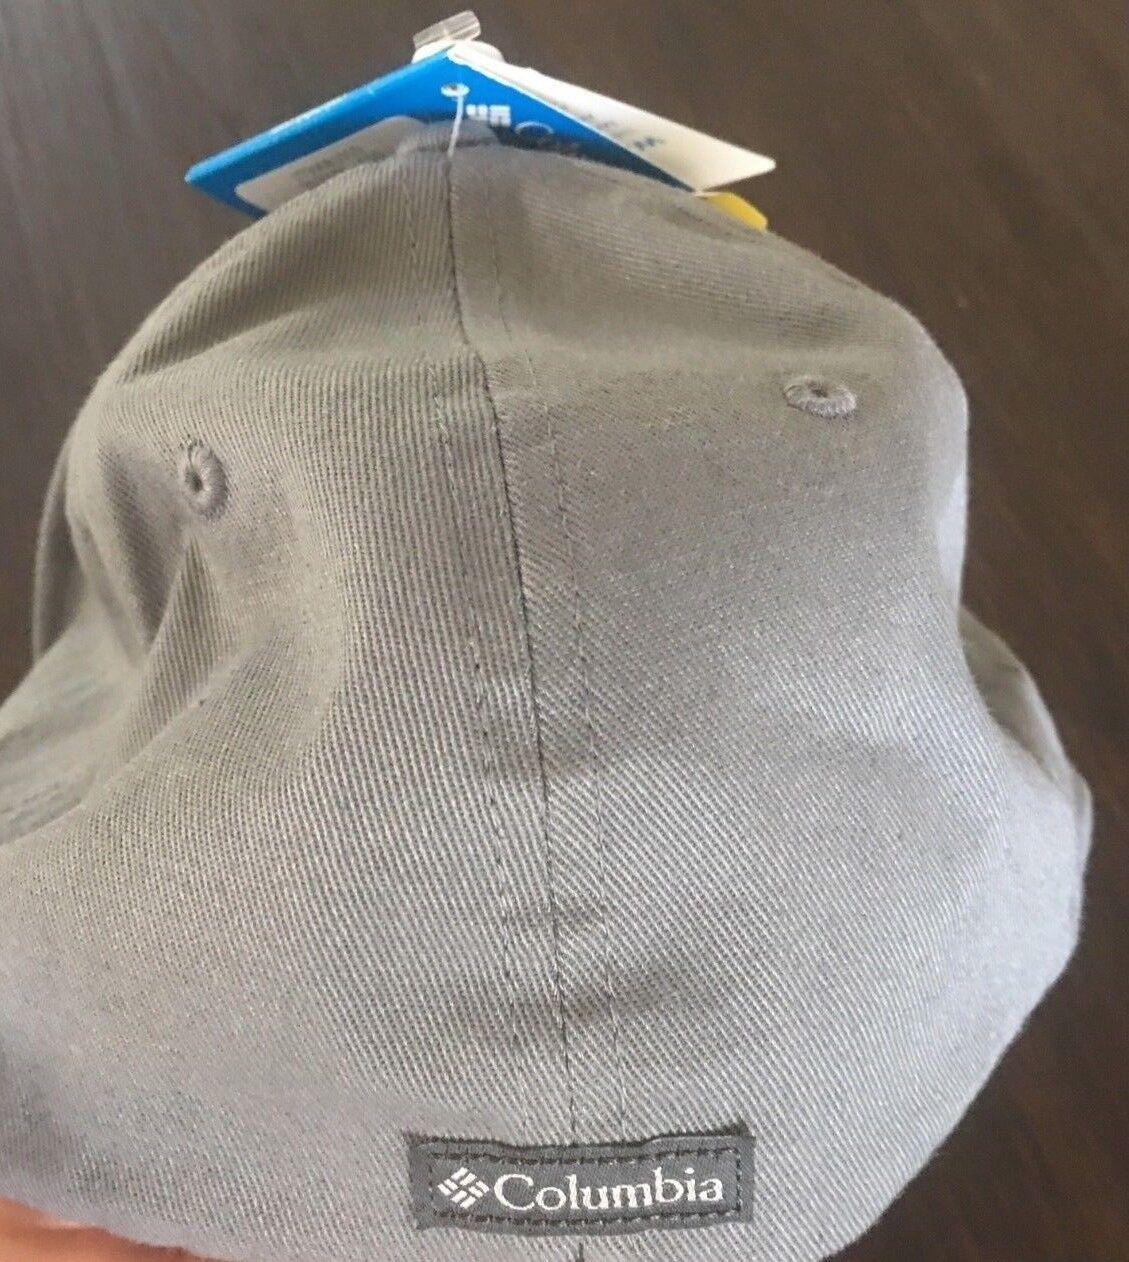 214ef70719588 Columbia Sportswear Portland Ave Cap Hat Gray Black S m Xu0020 010 ...